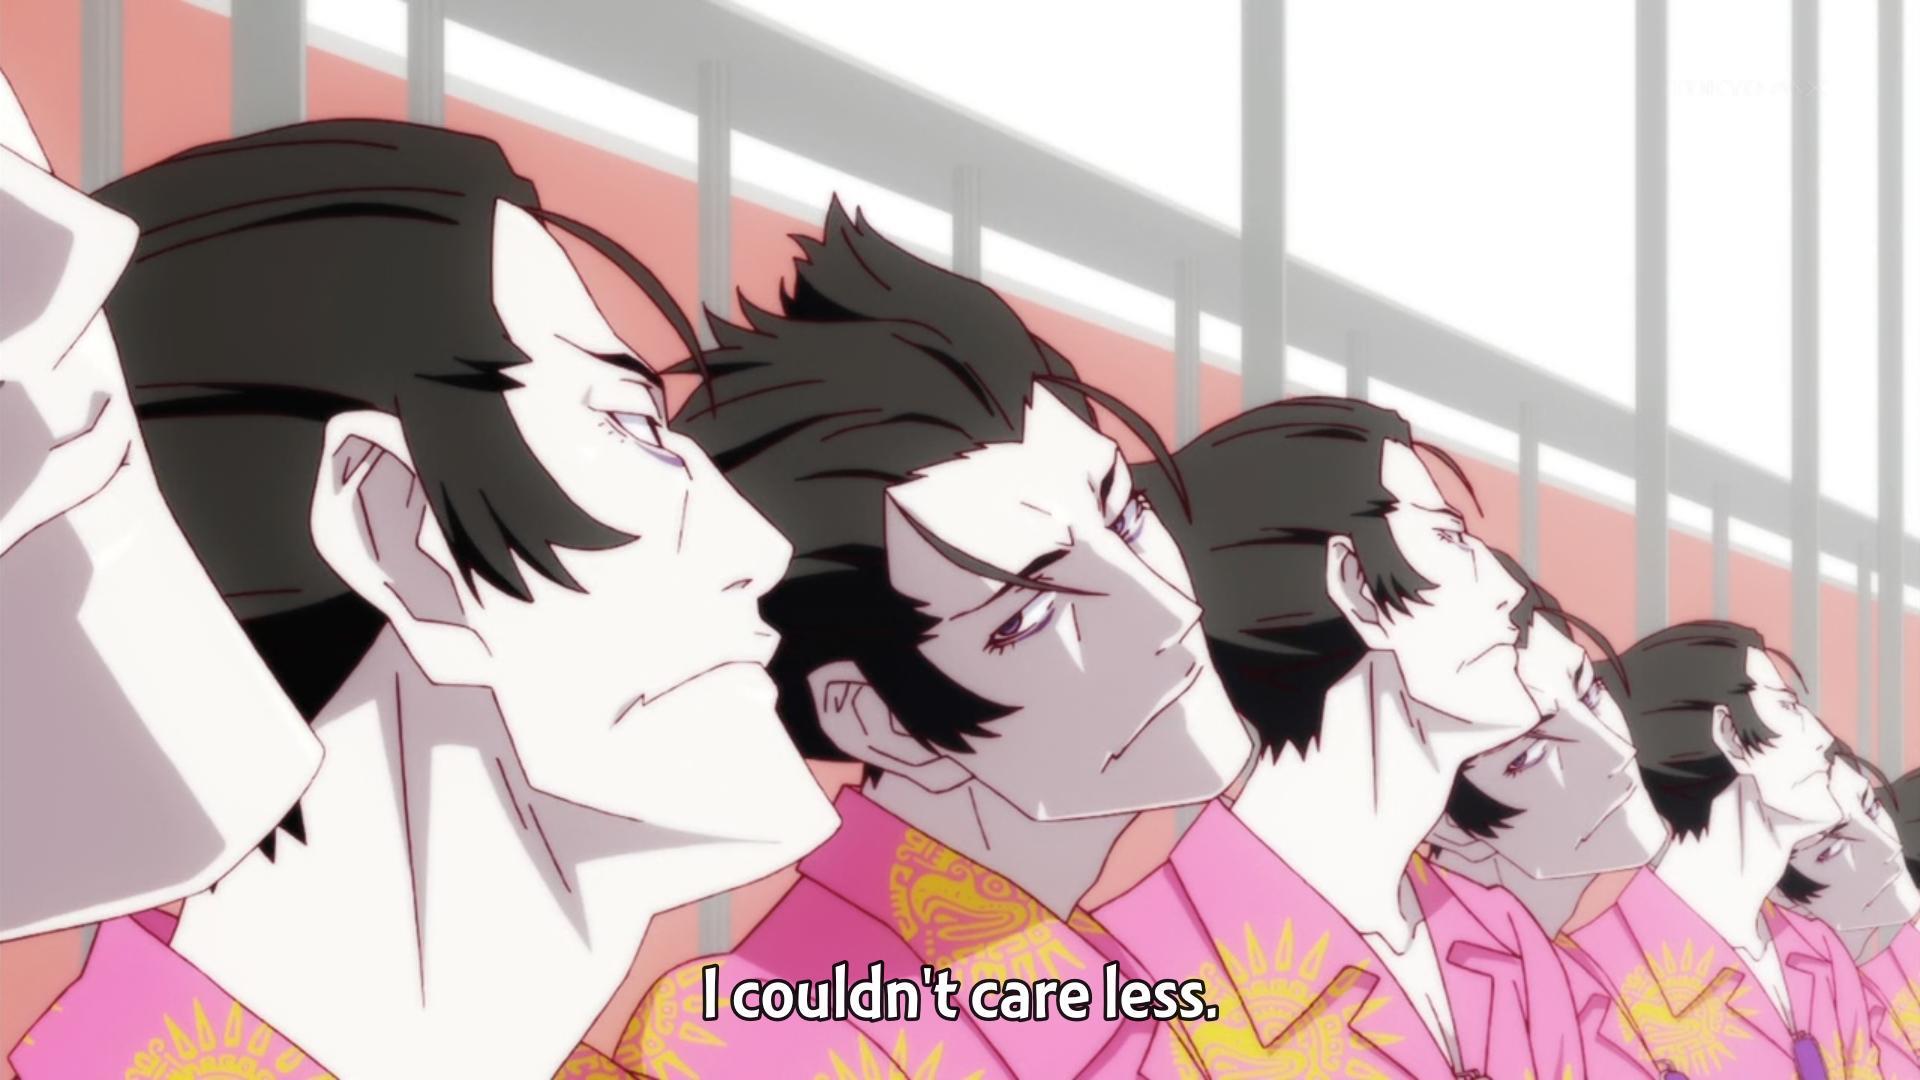 Monogatari S2 Episode 21 Wrong Every Time